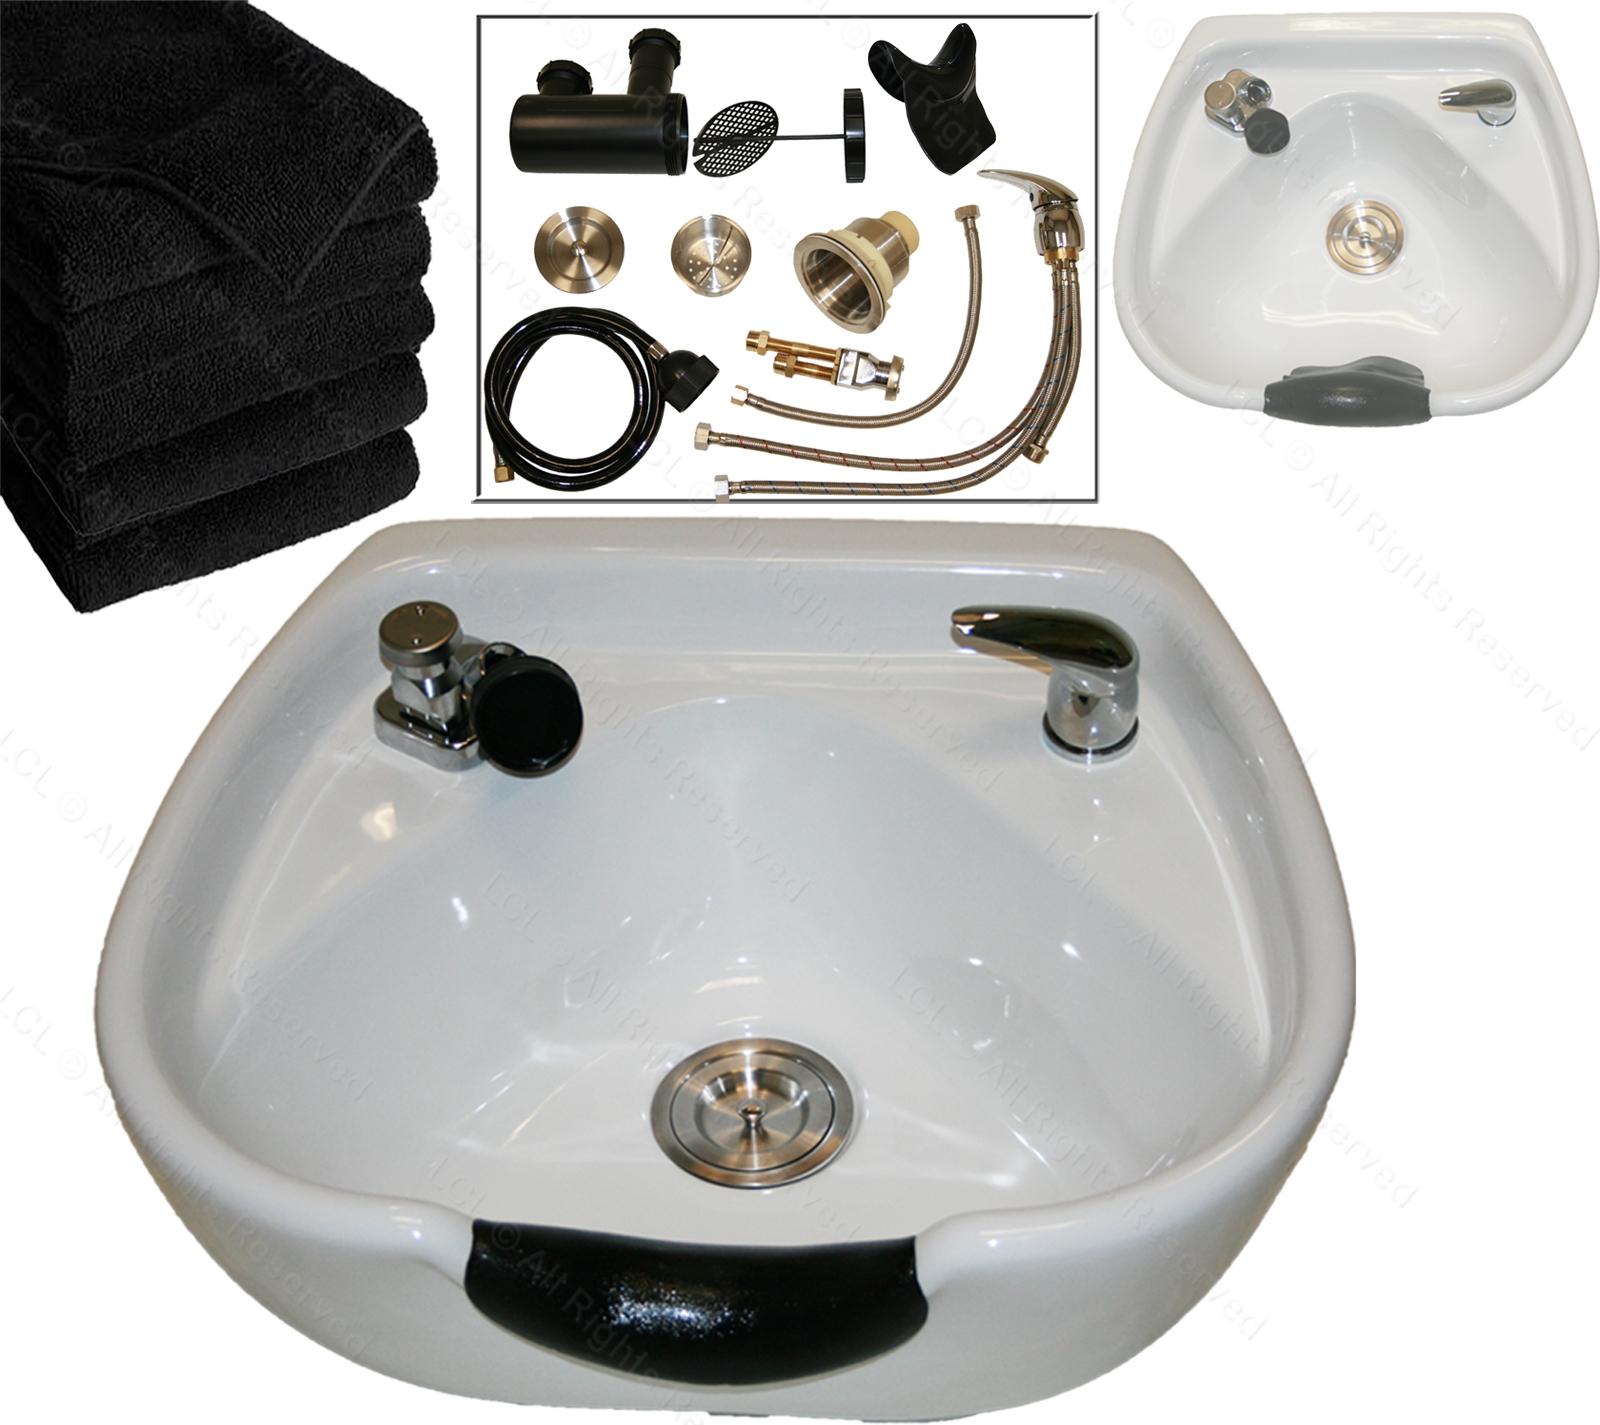 Ideas, white ceramic heart shape round shampoo bowl sink bracket barber pertaining to dimensions 1600 x 1425  .